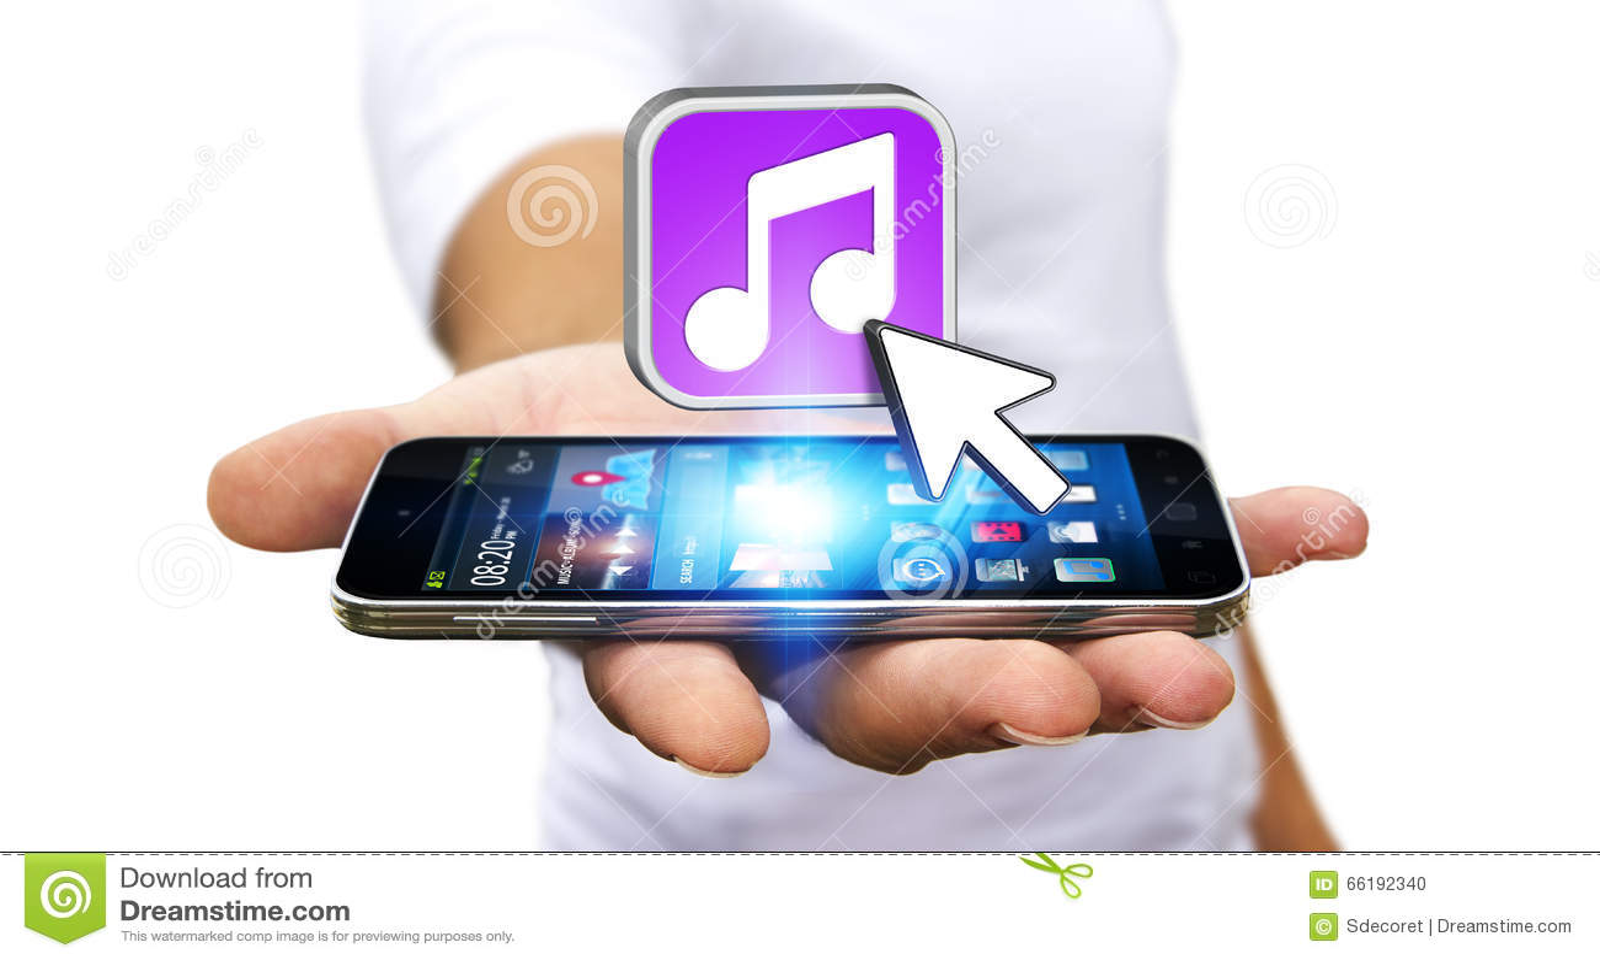 ecouter communication portable